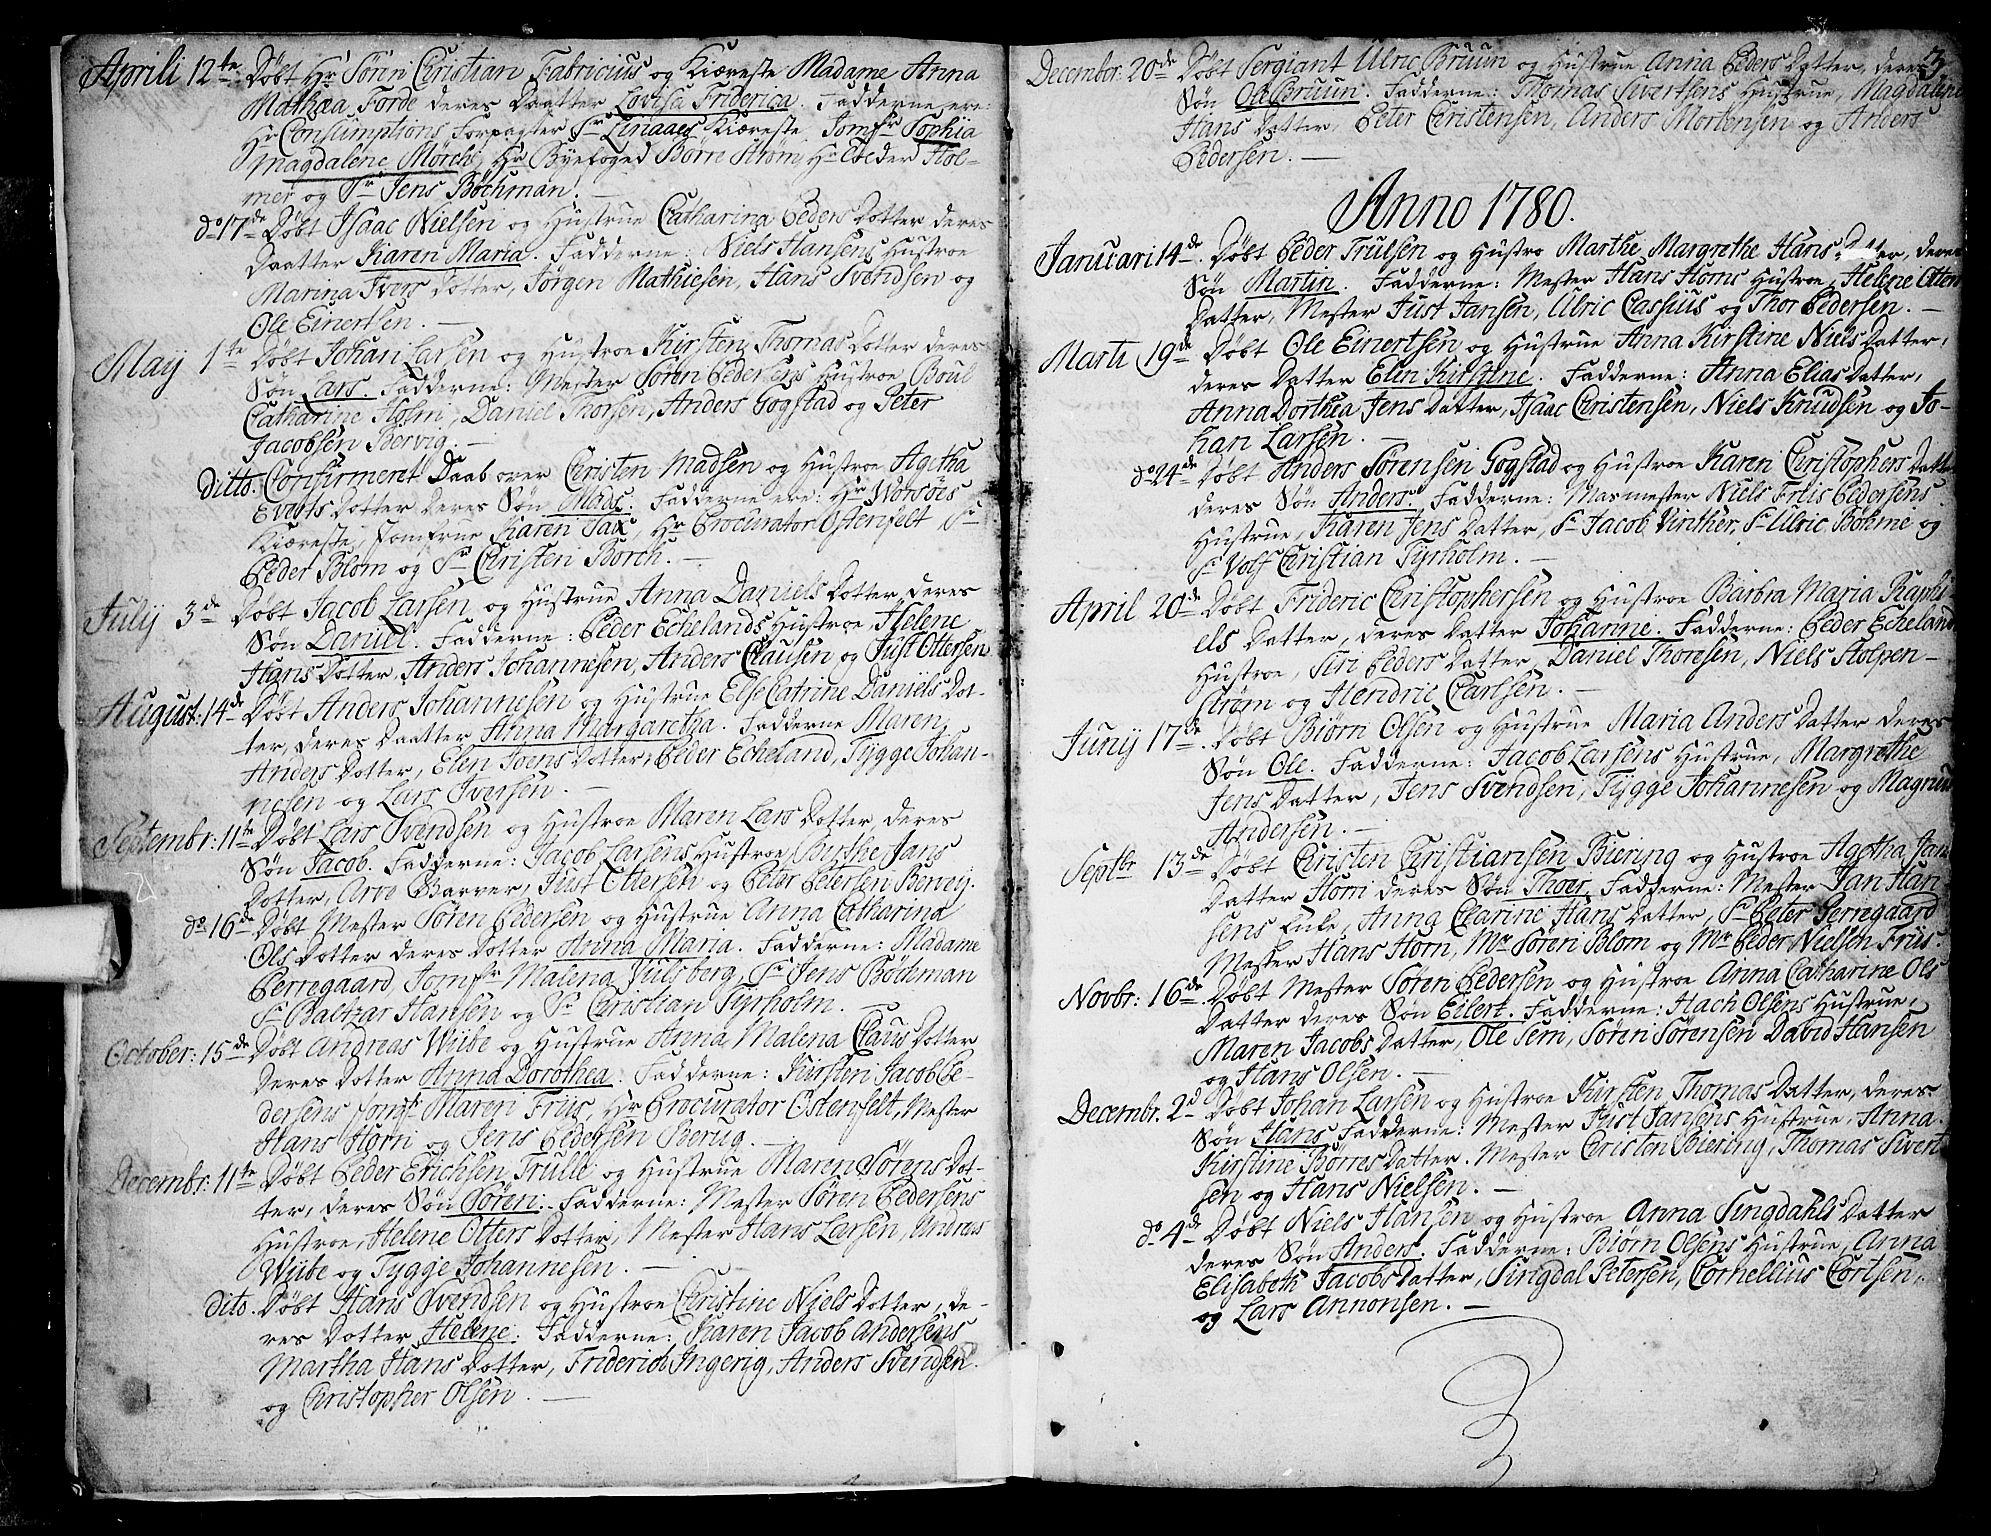 SAKO, Larvik kirkebøker, F/Fb/L0001: Ministerialbok nr. II 1, 1779-1817, s. 3